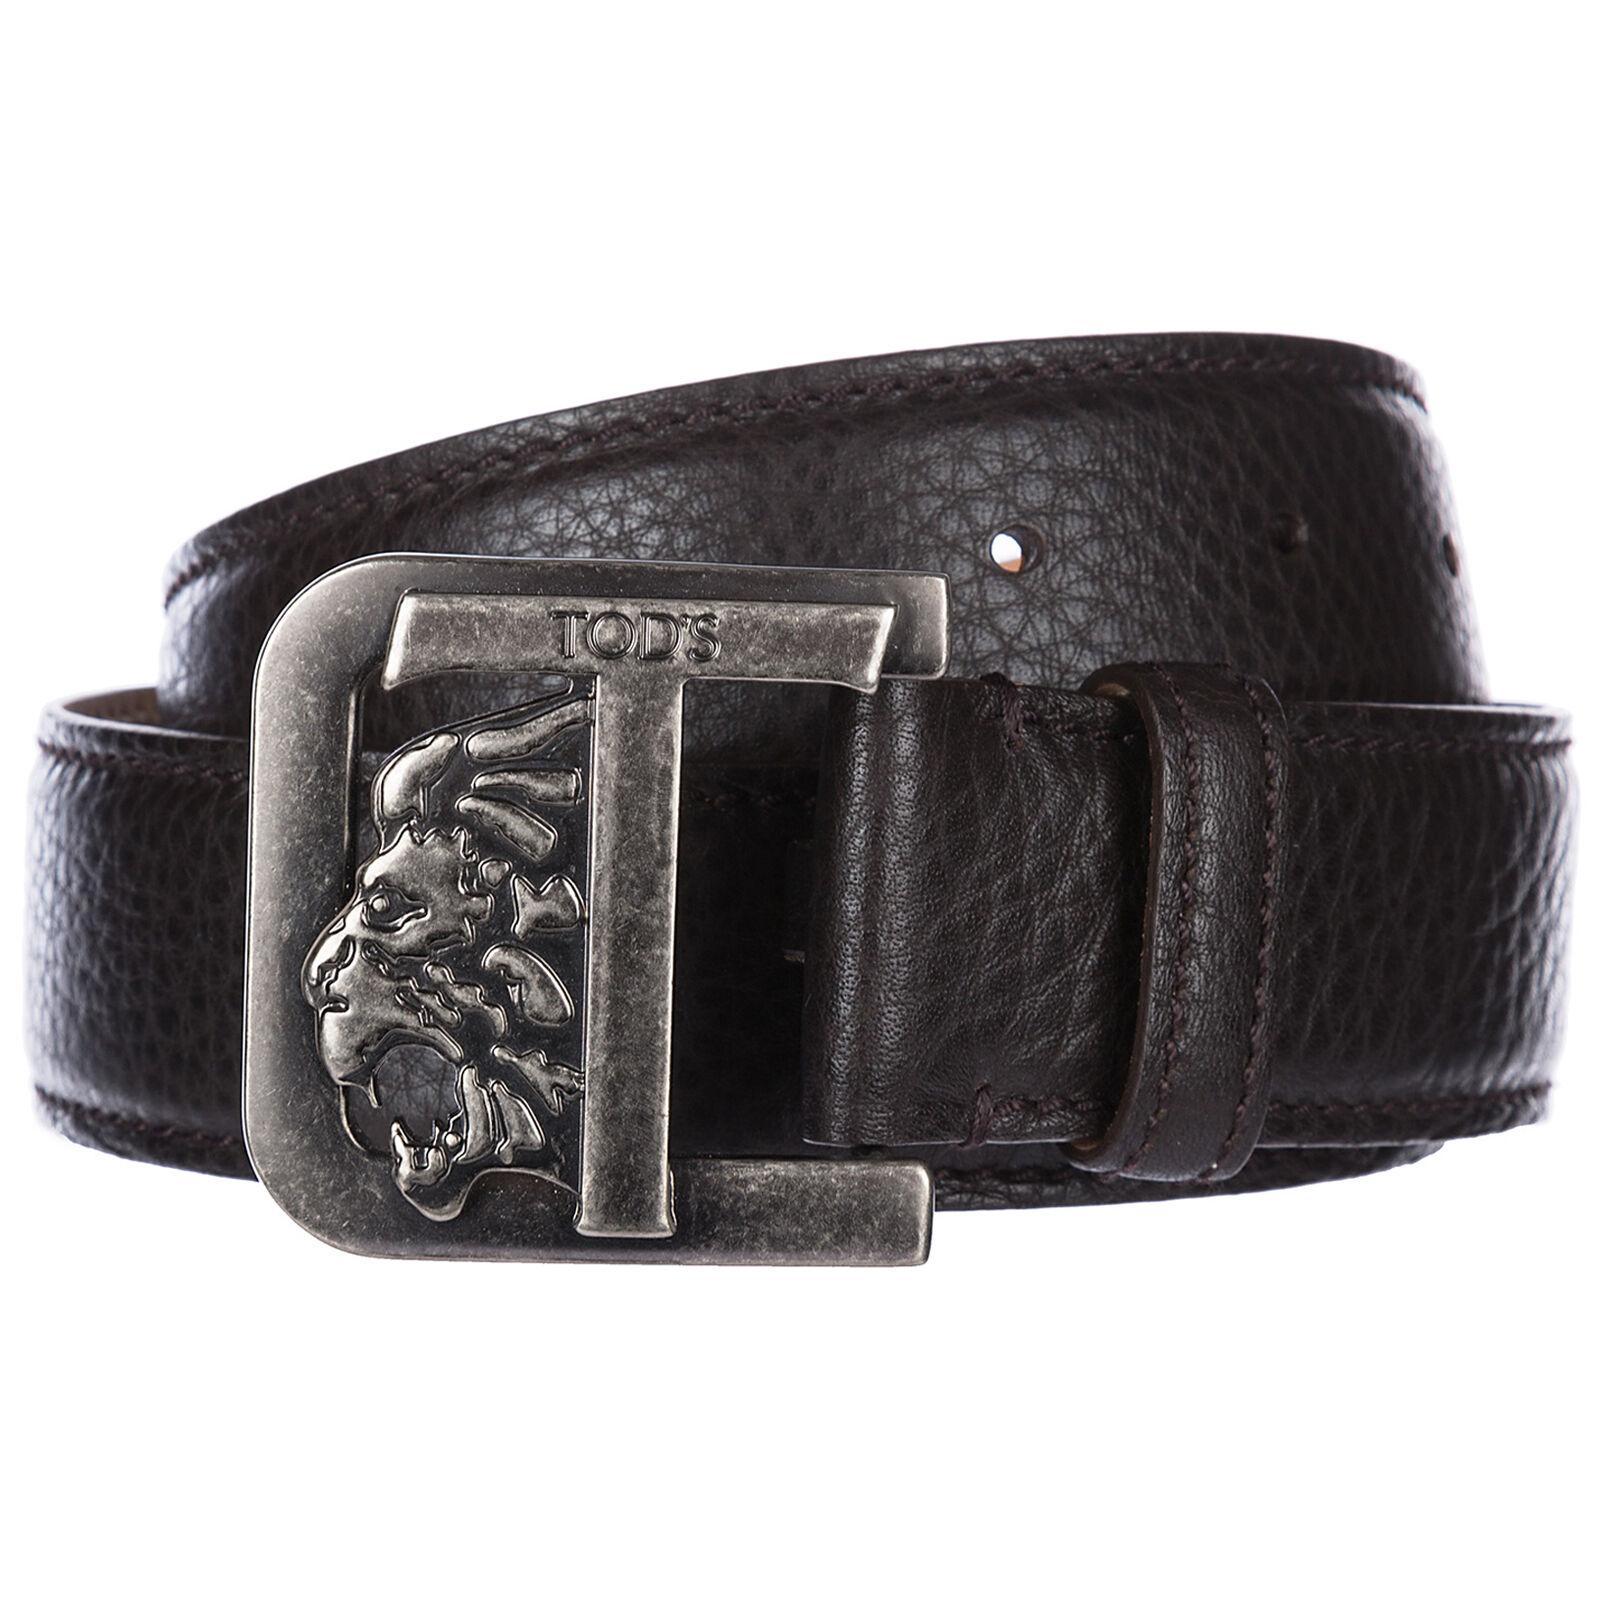 Tod's Men's genuine leather belt  - Brown - Size: 95